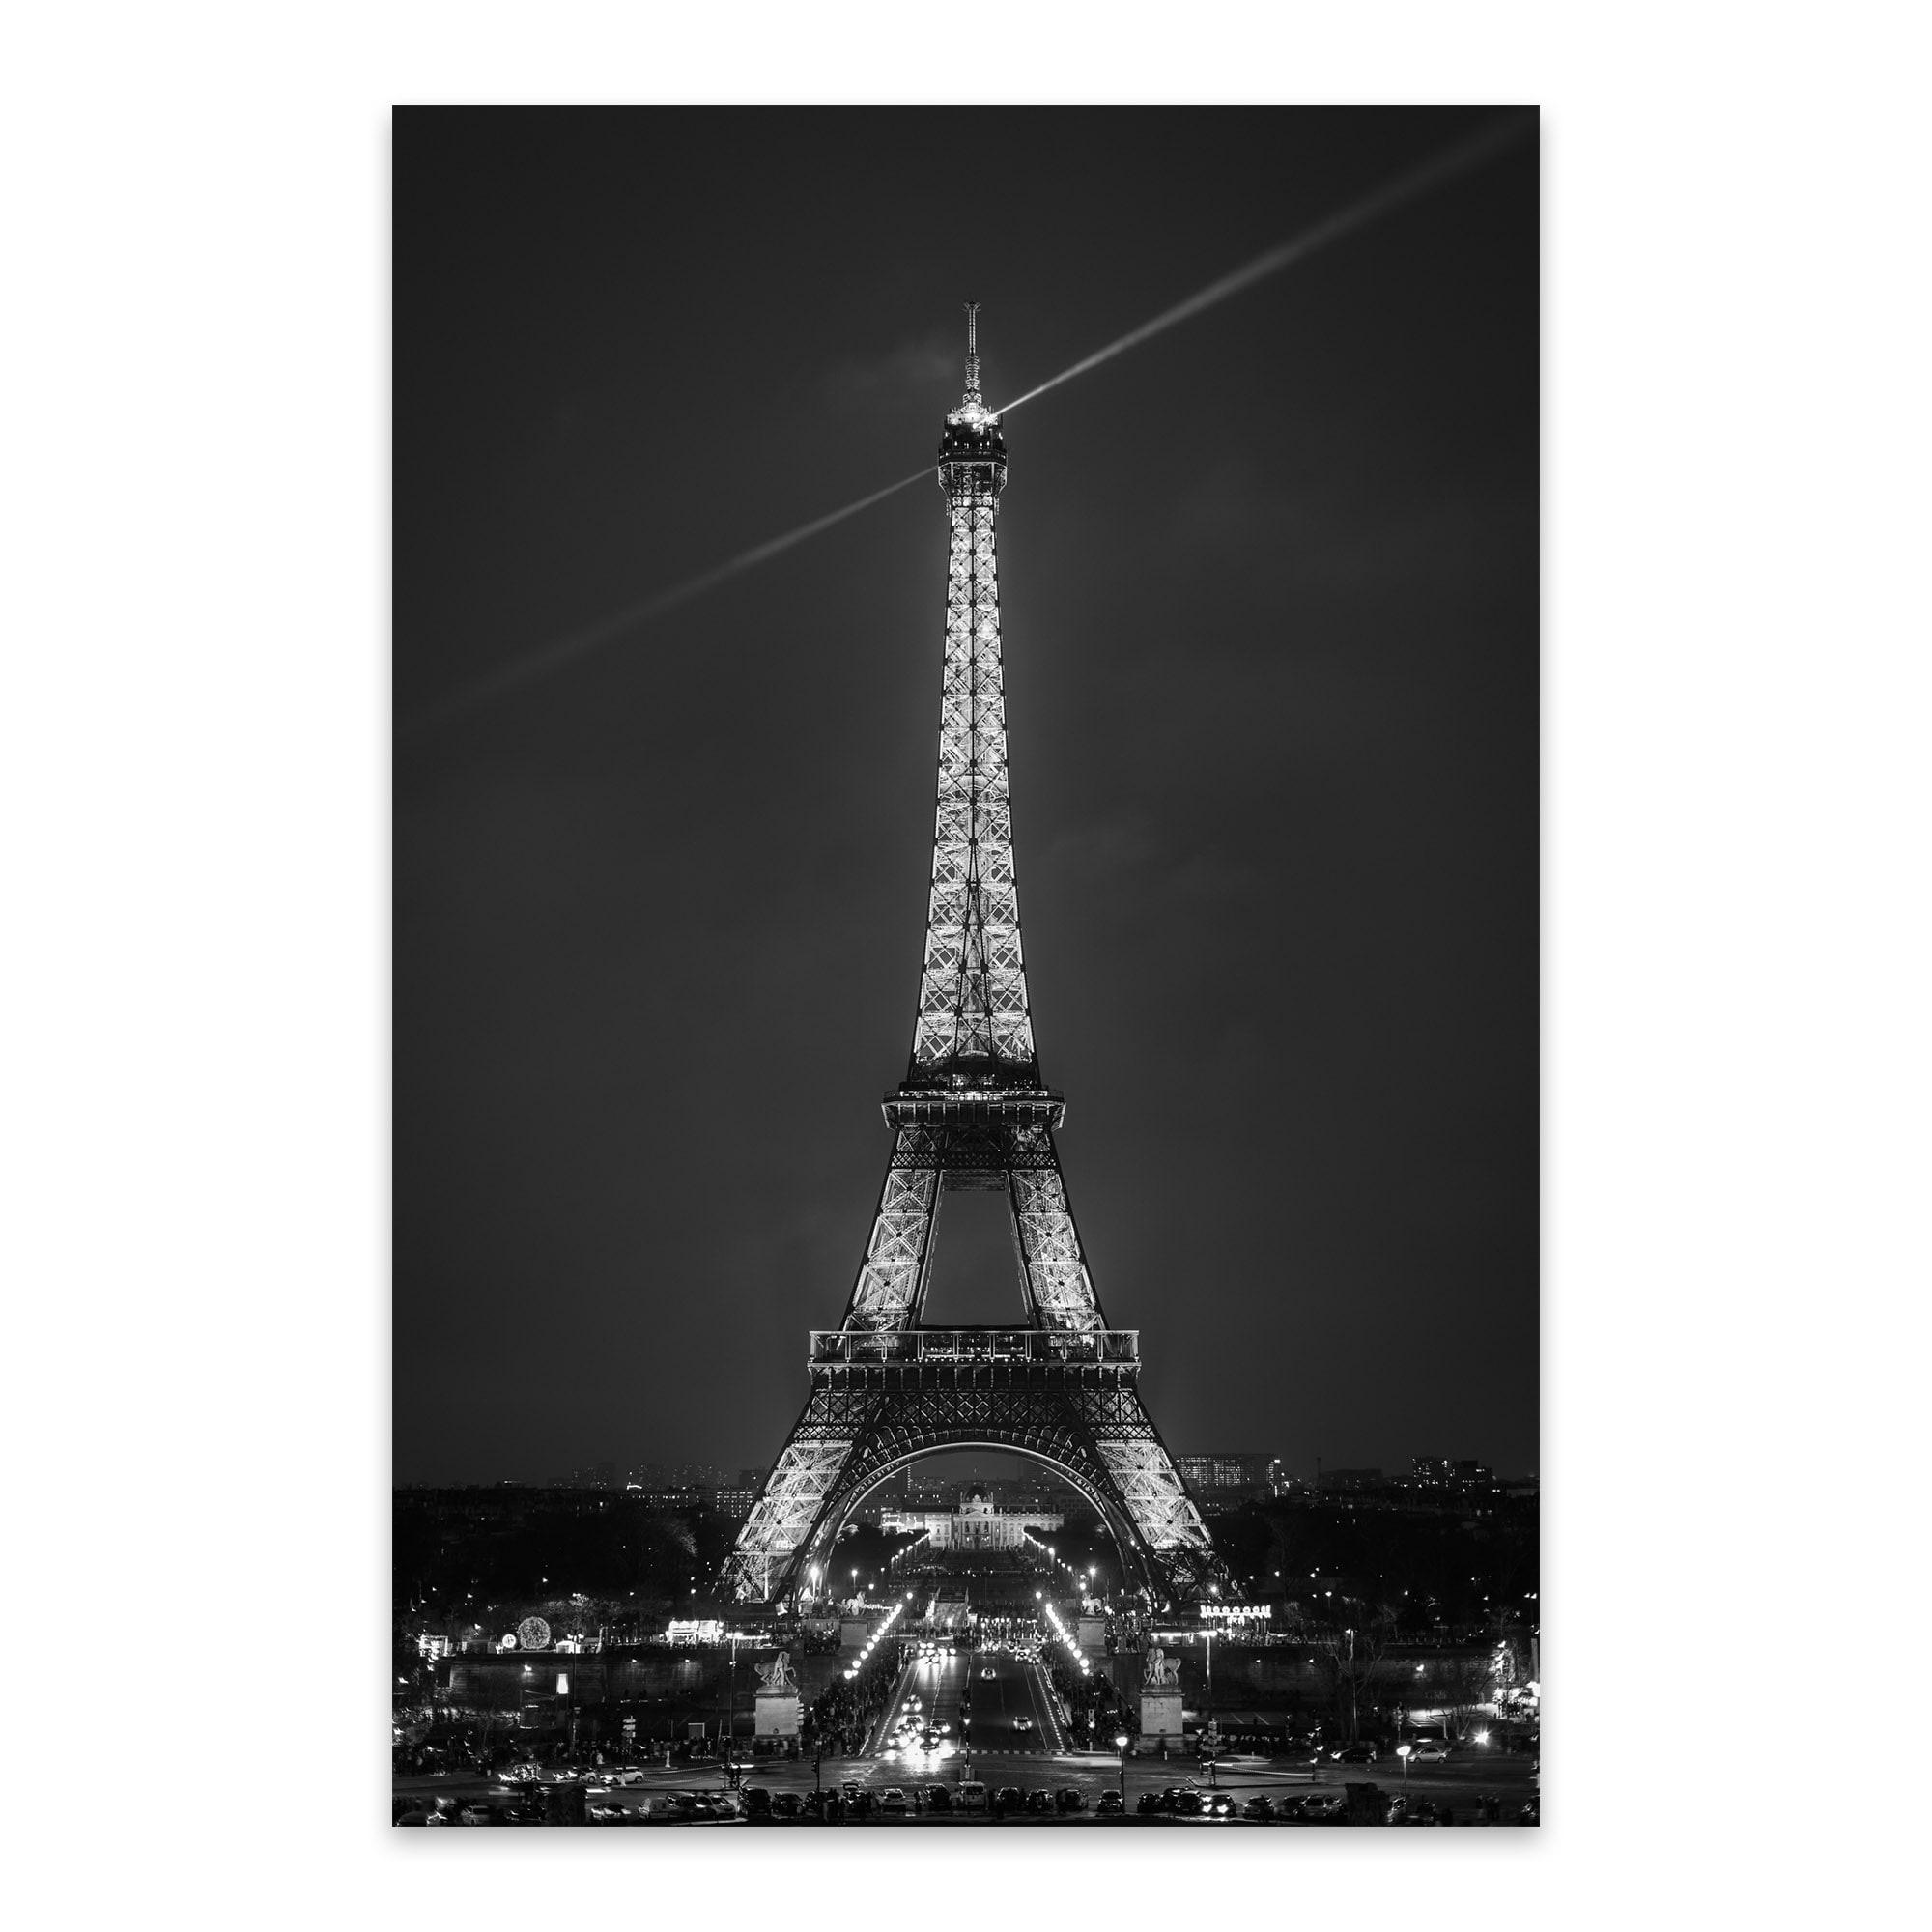 Shop Noir Gallery Black White Paris Eiffel Tower Metal Wall Art Print Overstock 27561845